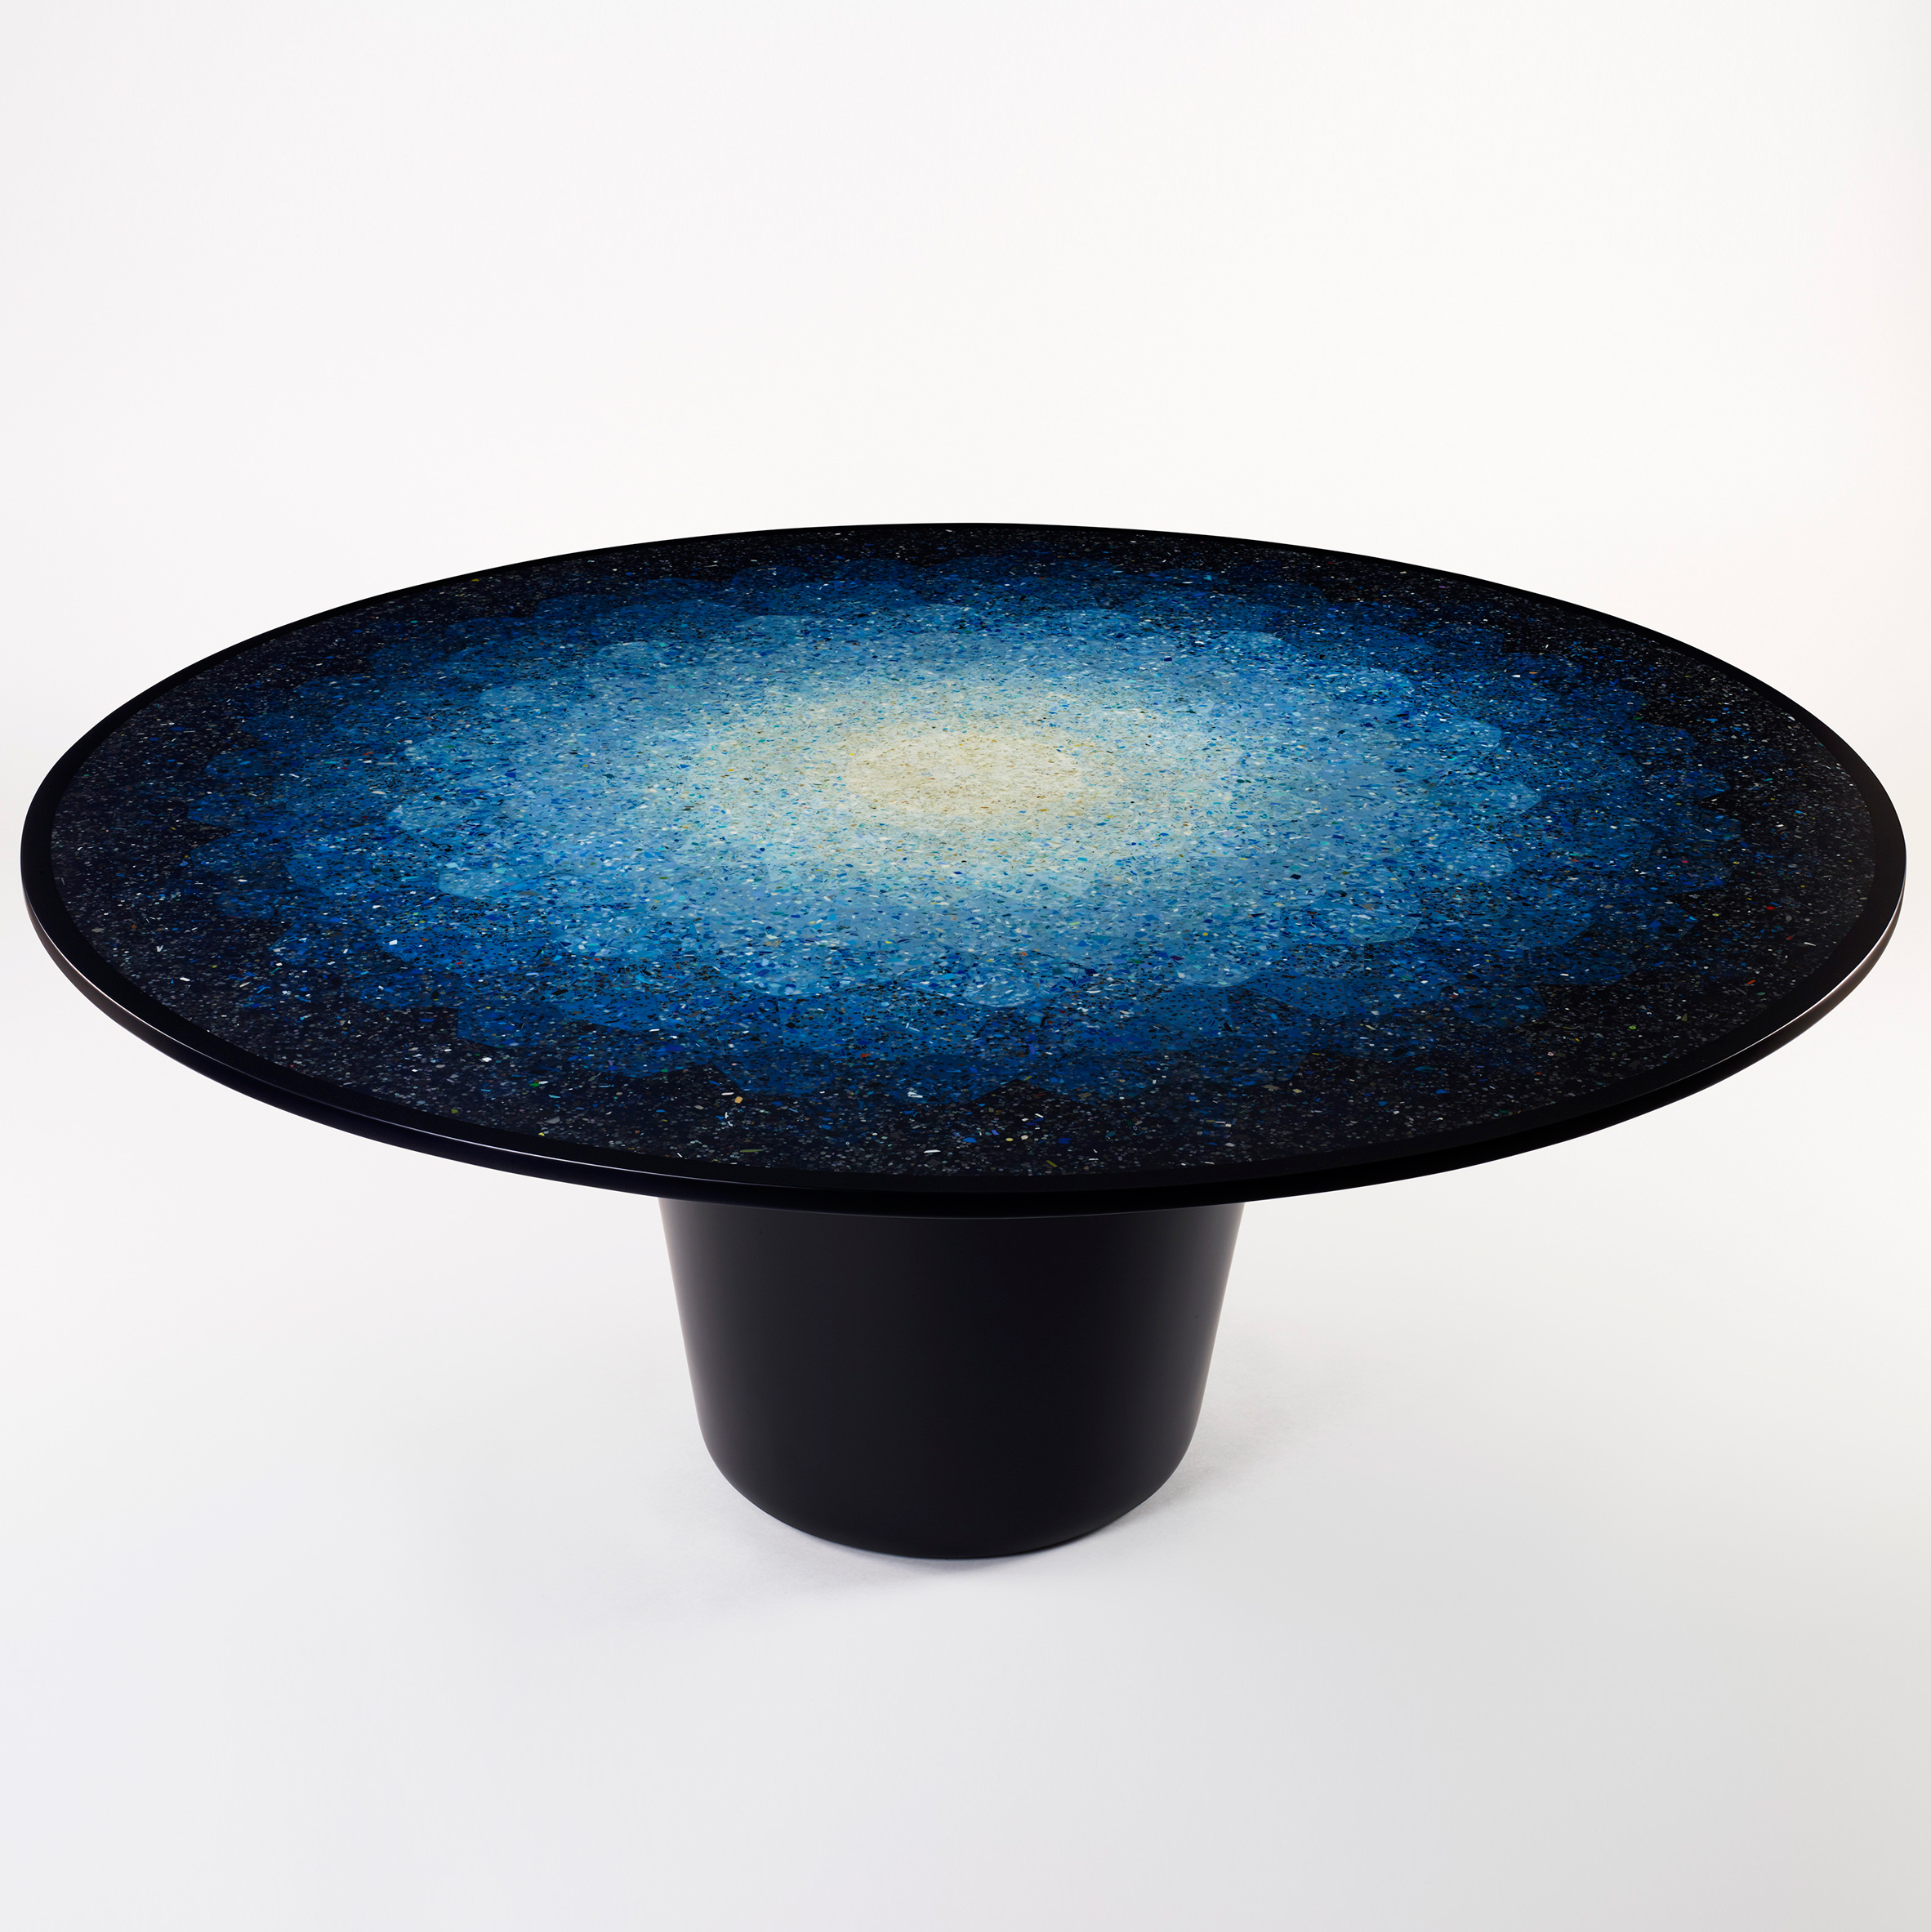 LDB: Ocean terrazzo table by Brodie Neill for LDB